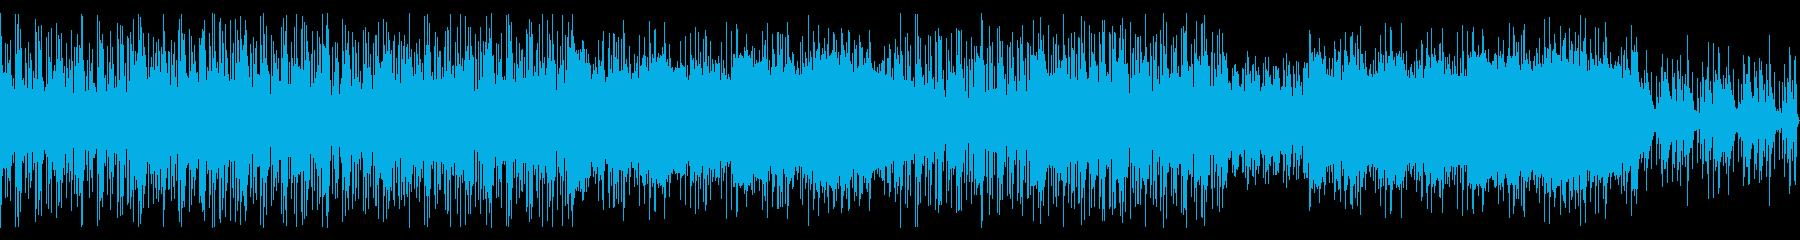 Battle1 [ループ仕様]の再生済みの波形